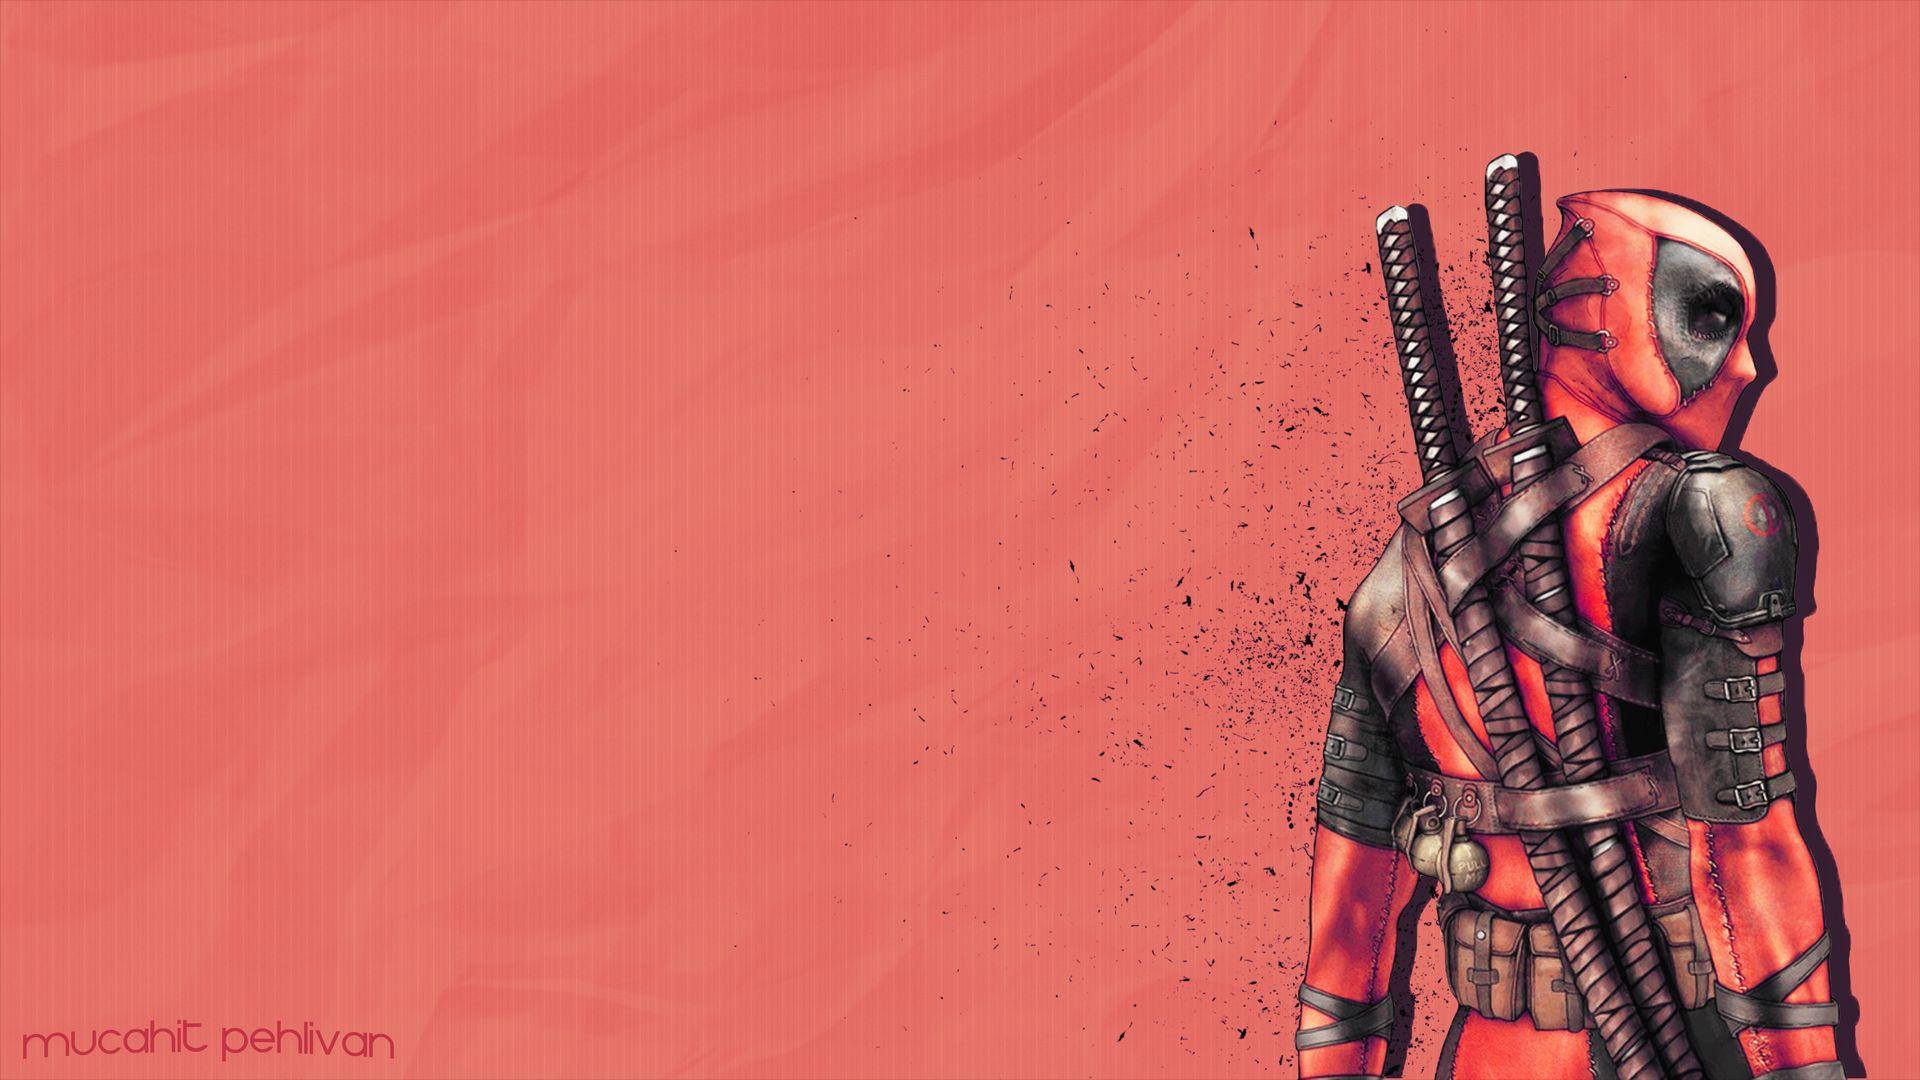 Cool Deadpool wallpaper photo hd